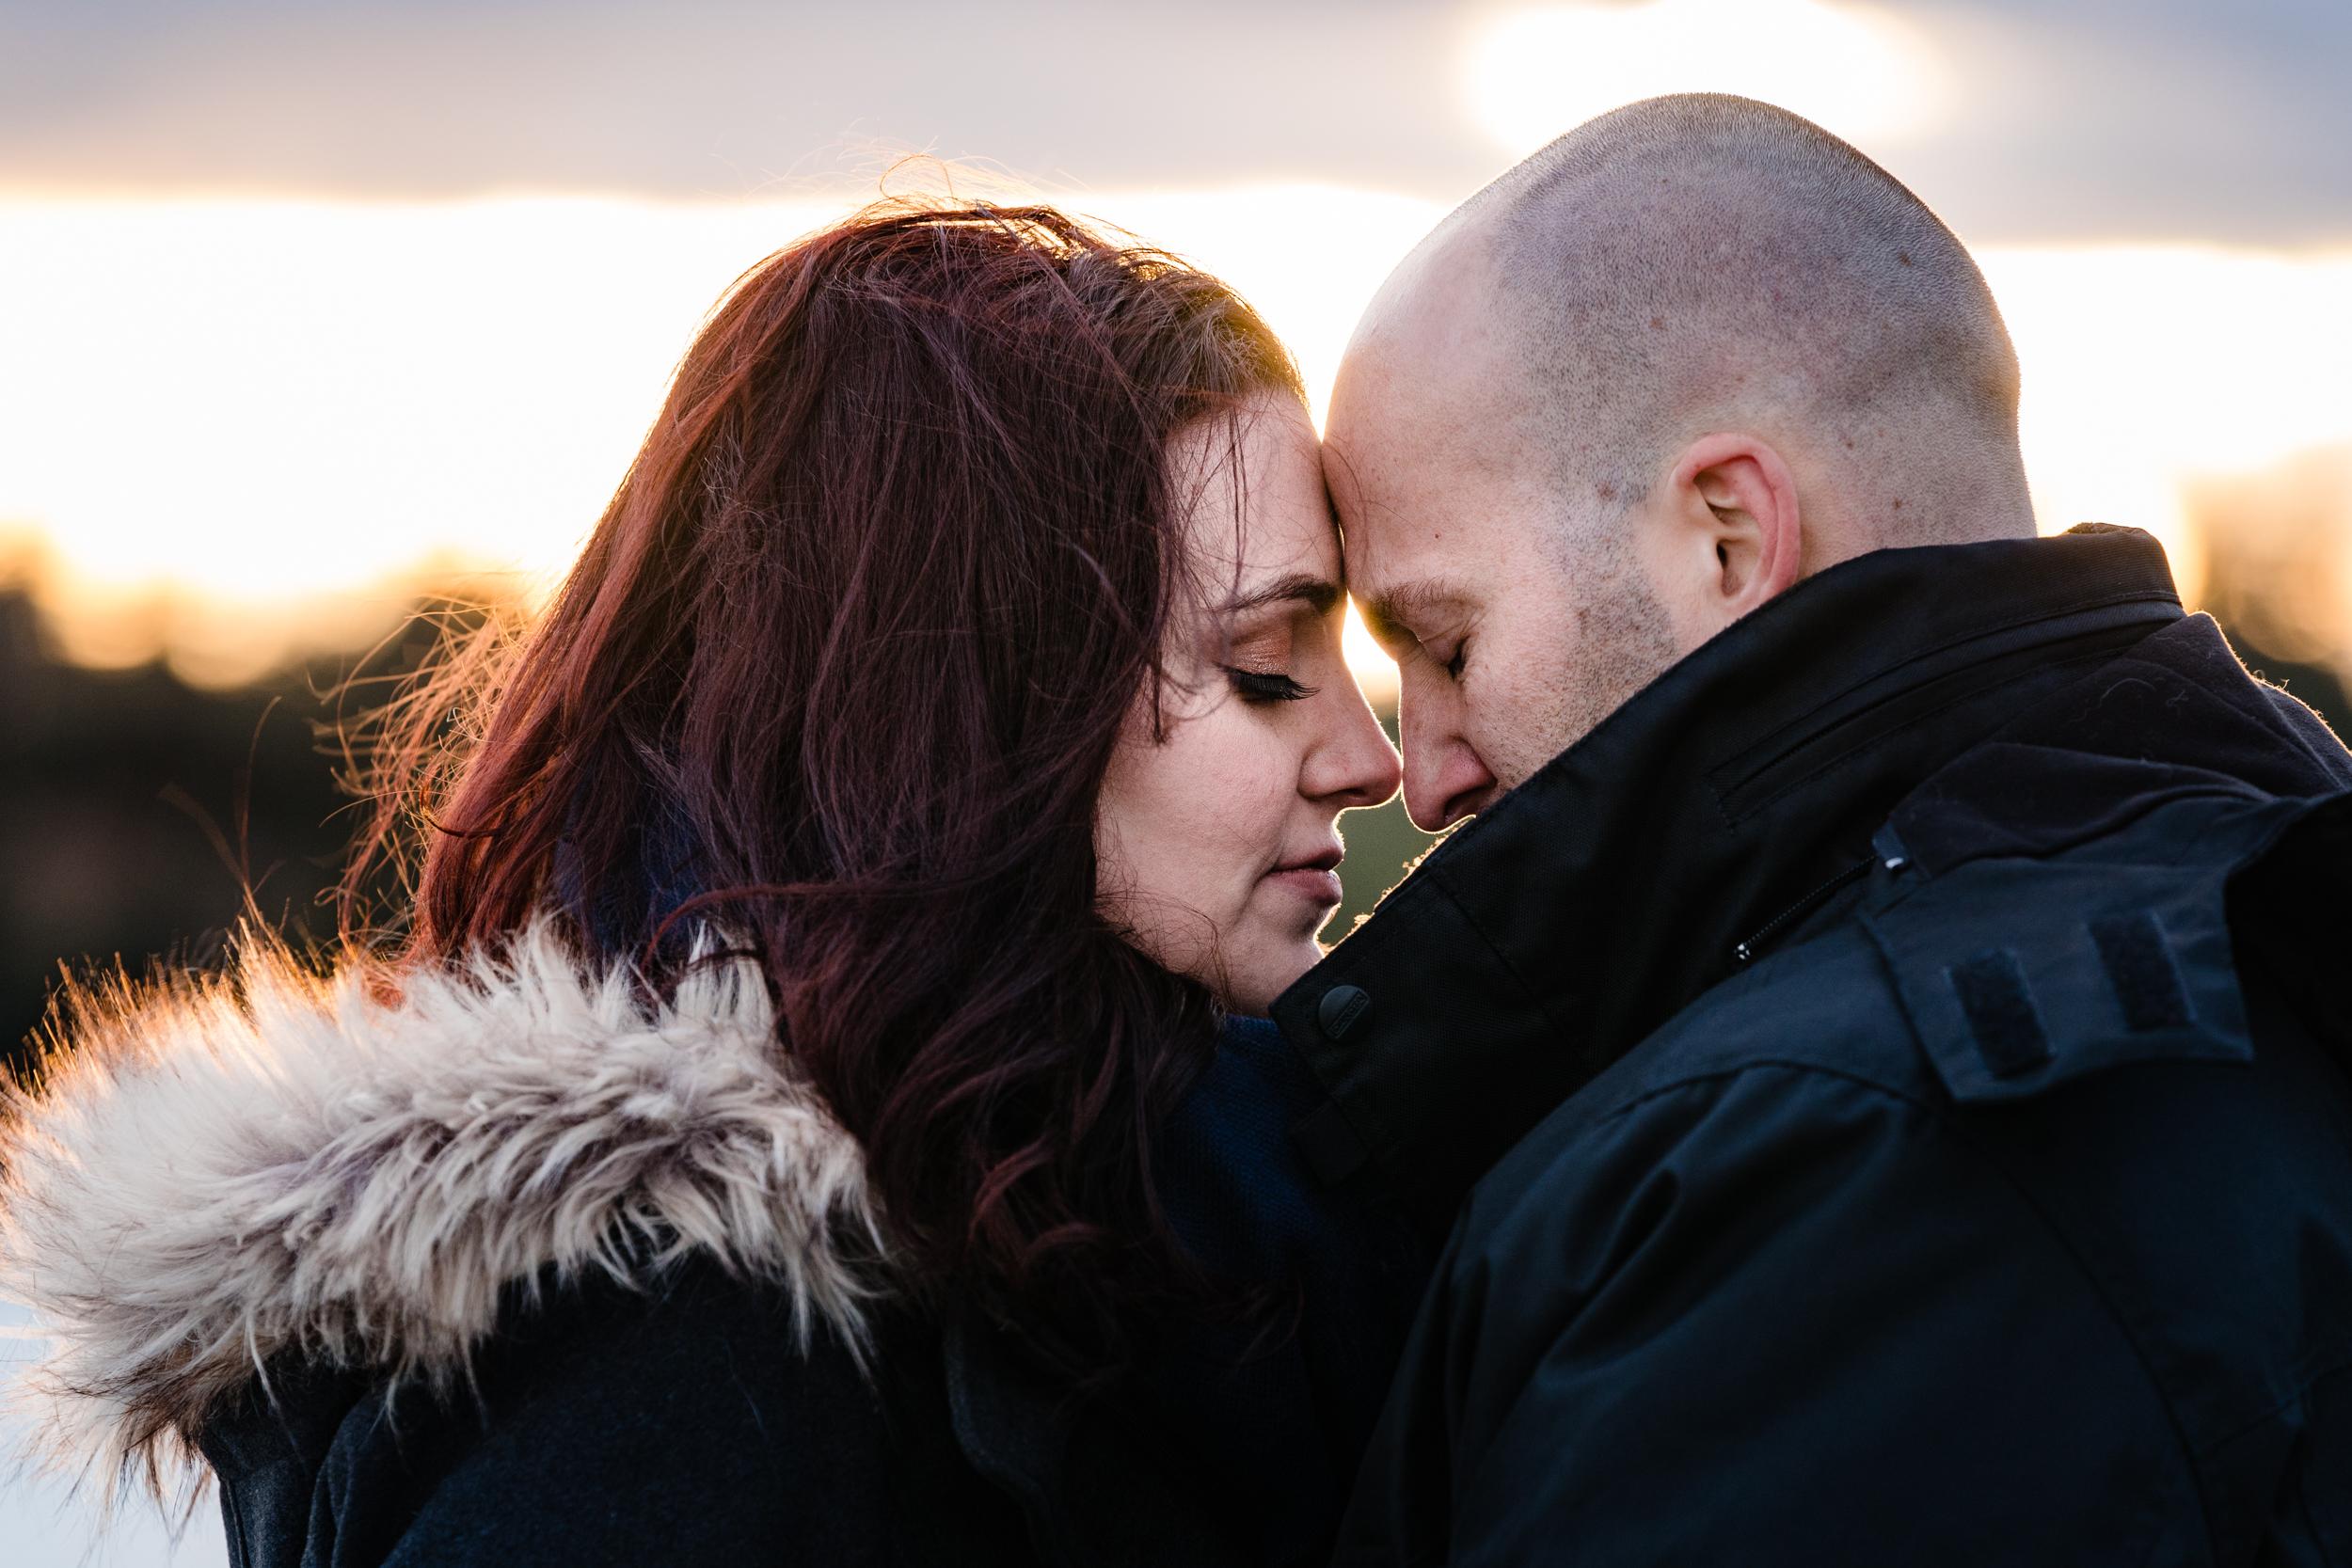 Sarah&Shayne-Halifax-engagement-weddingphotography-weddingphotographers-novascotia (36 of 41).jpg